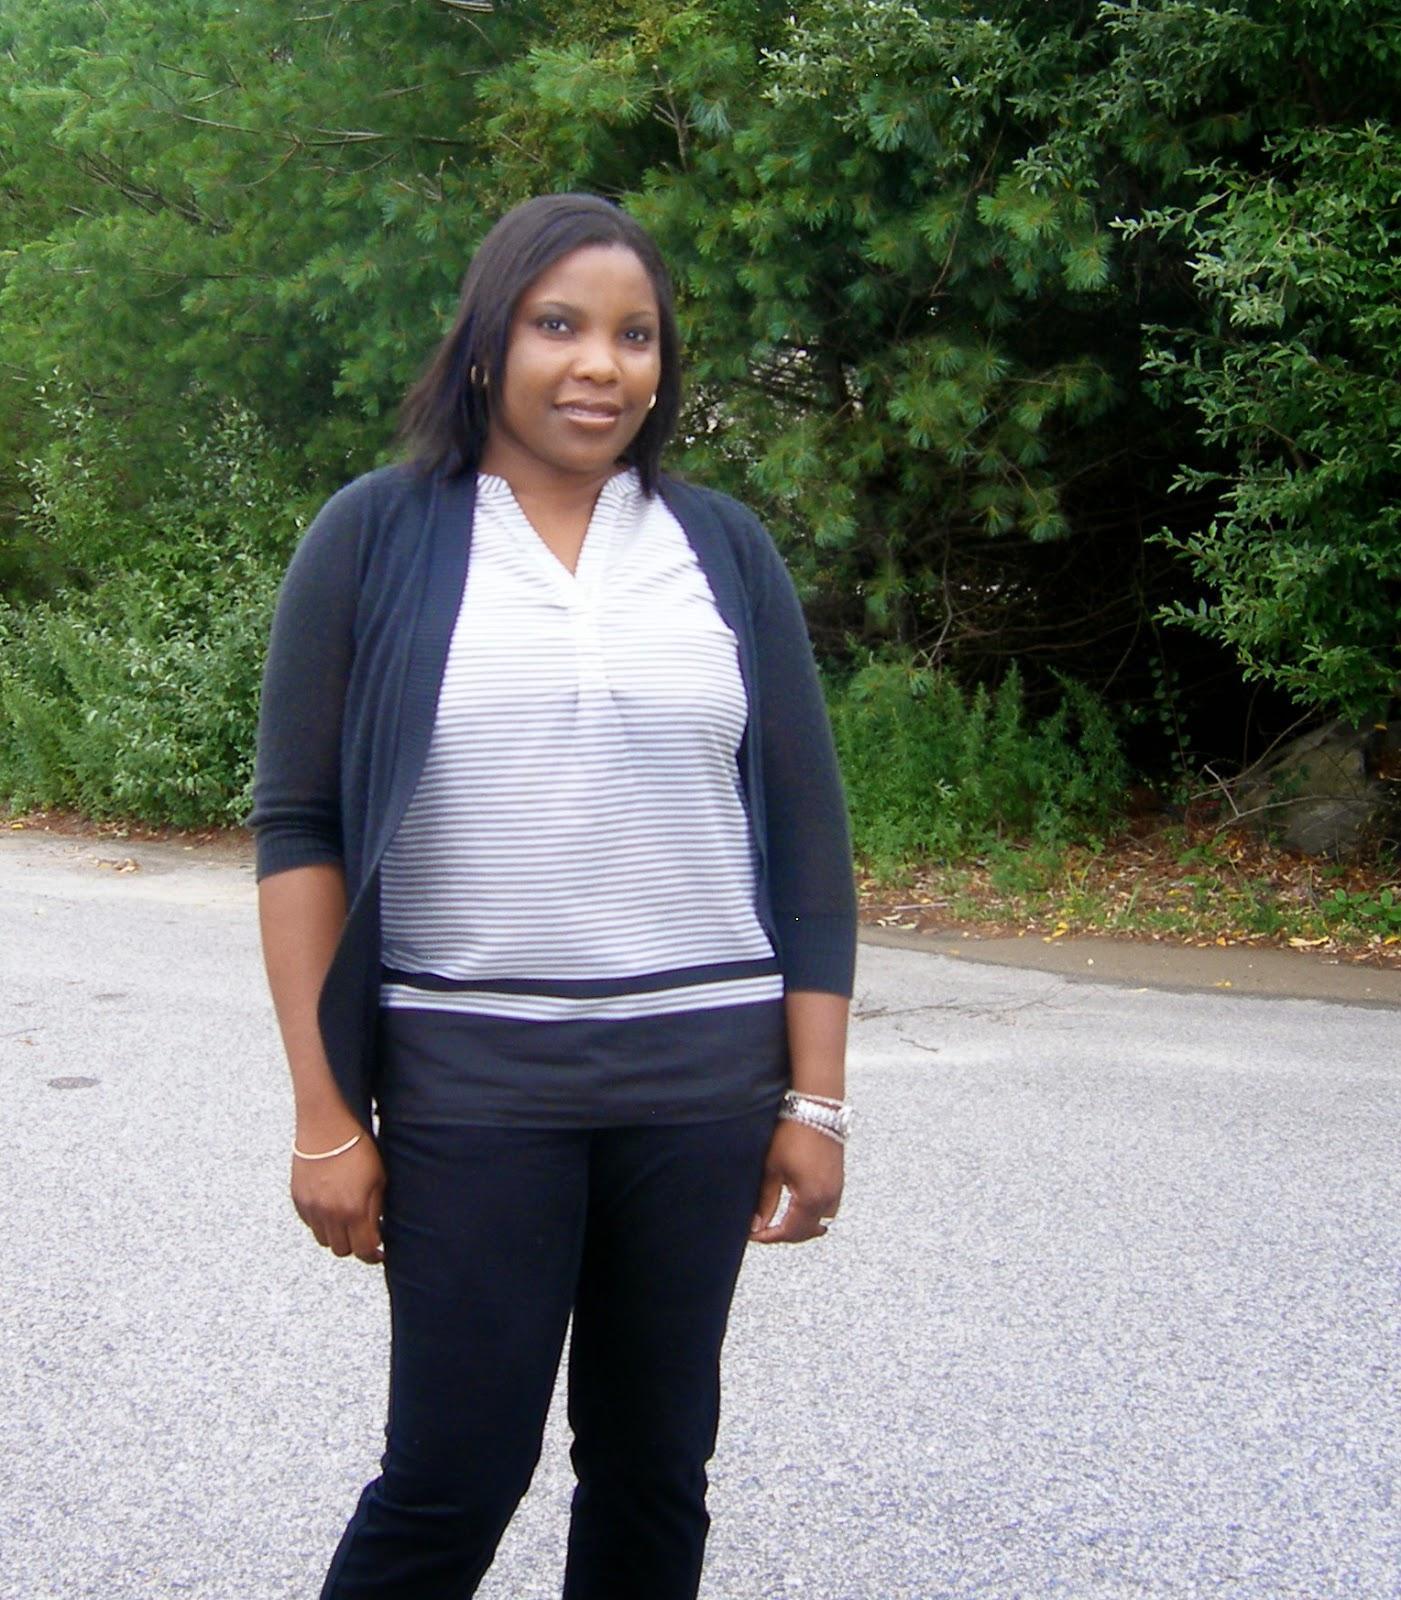 Merona Open Cardigan, target Cardigan, striped sleeveless blouse